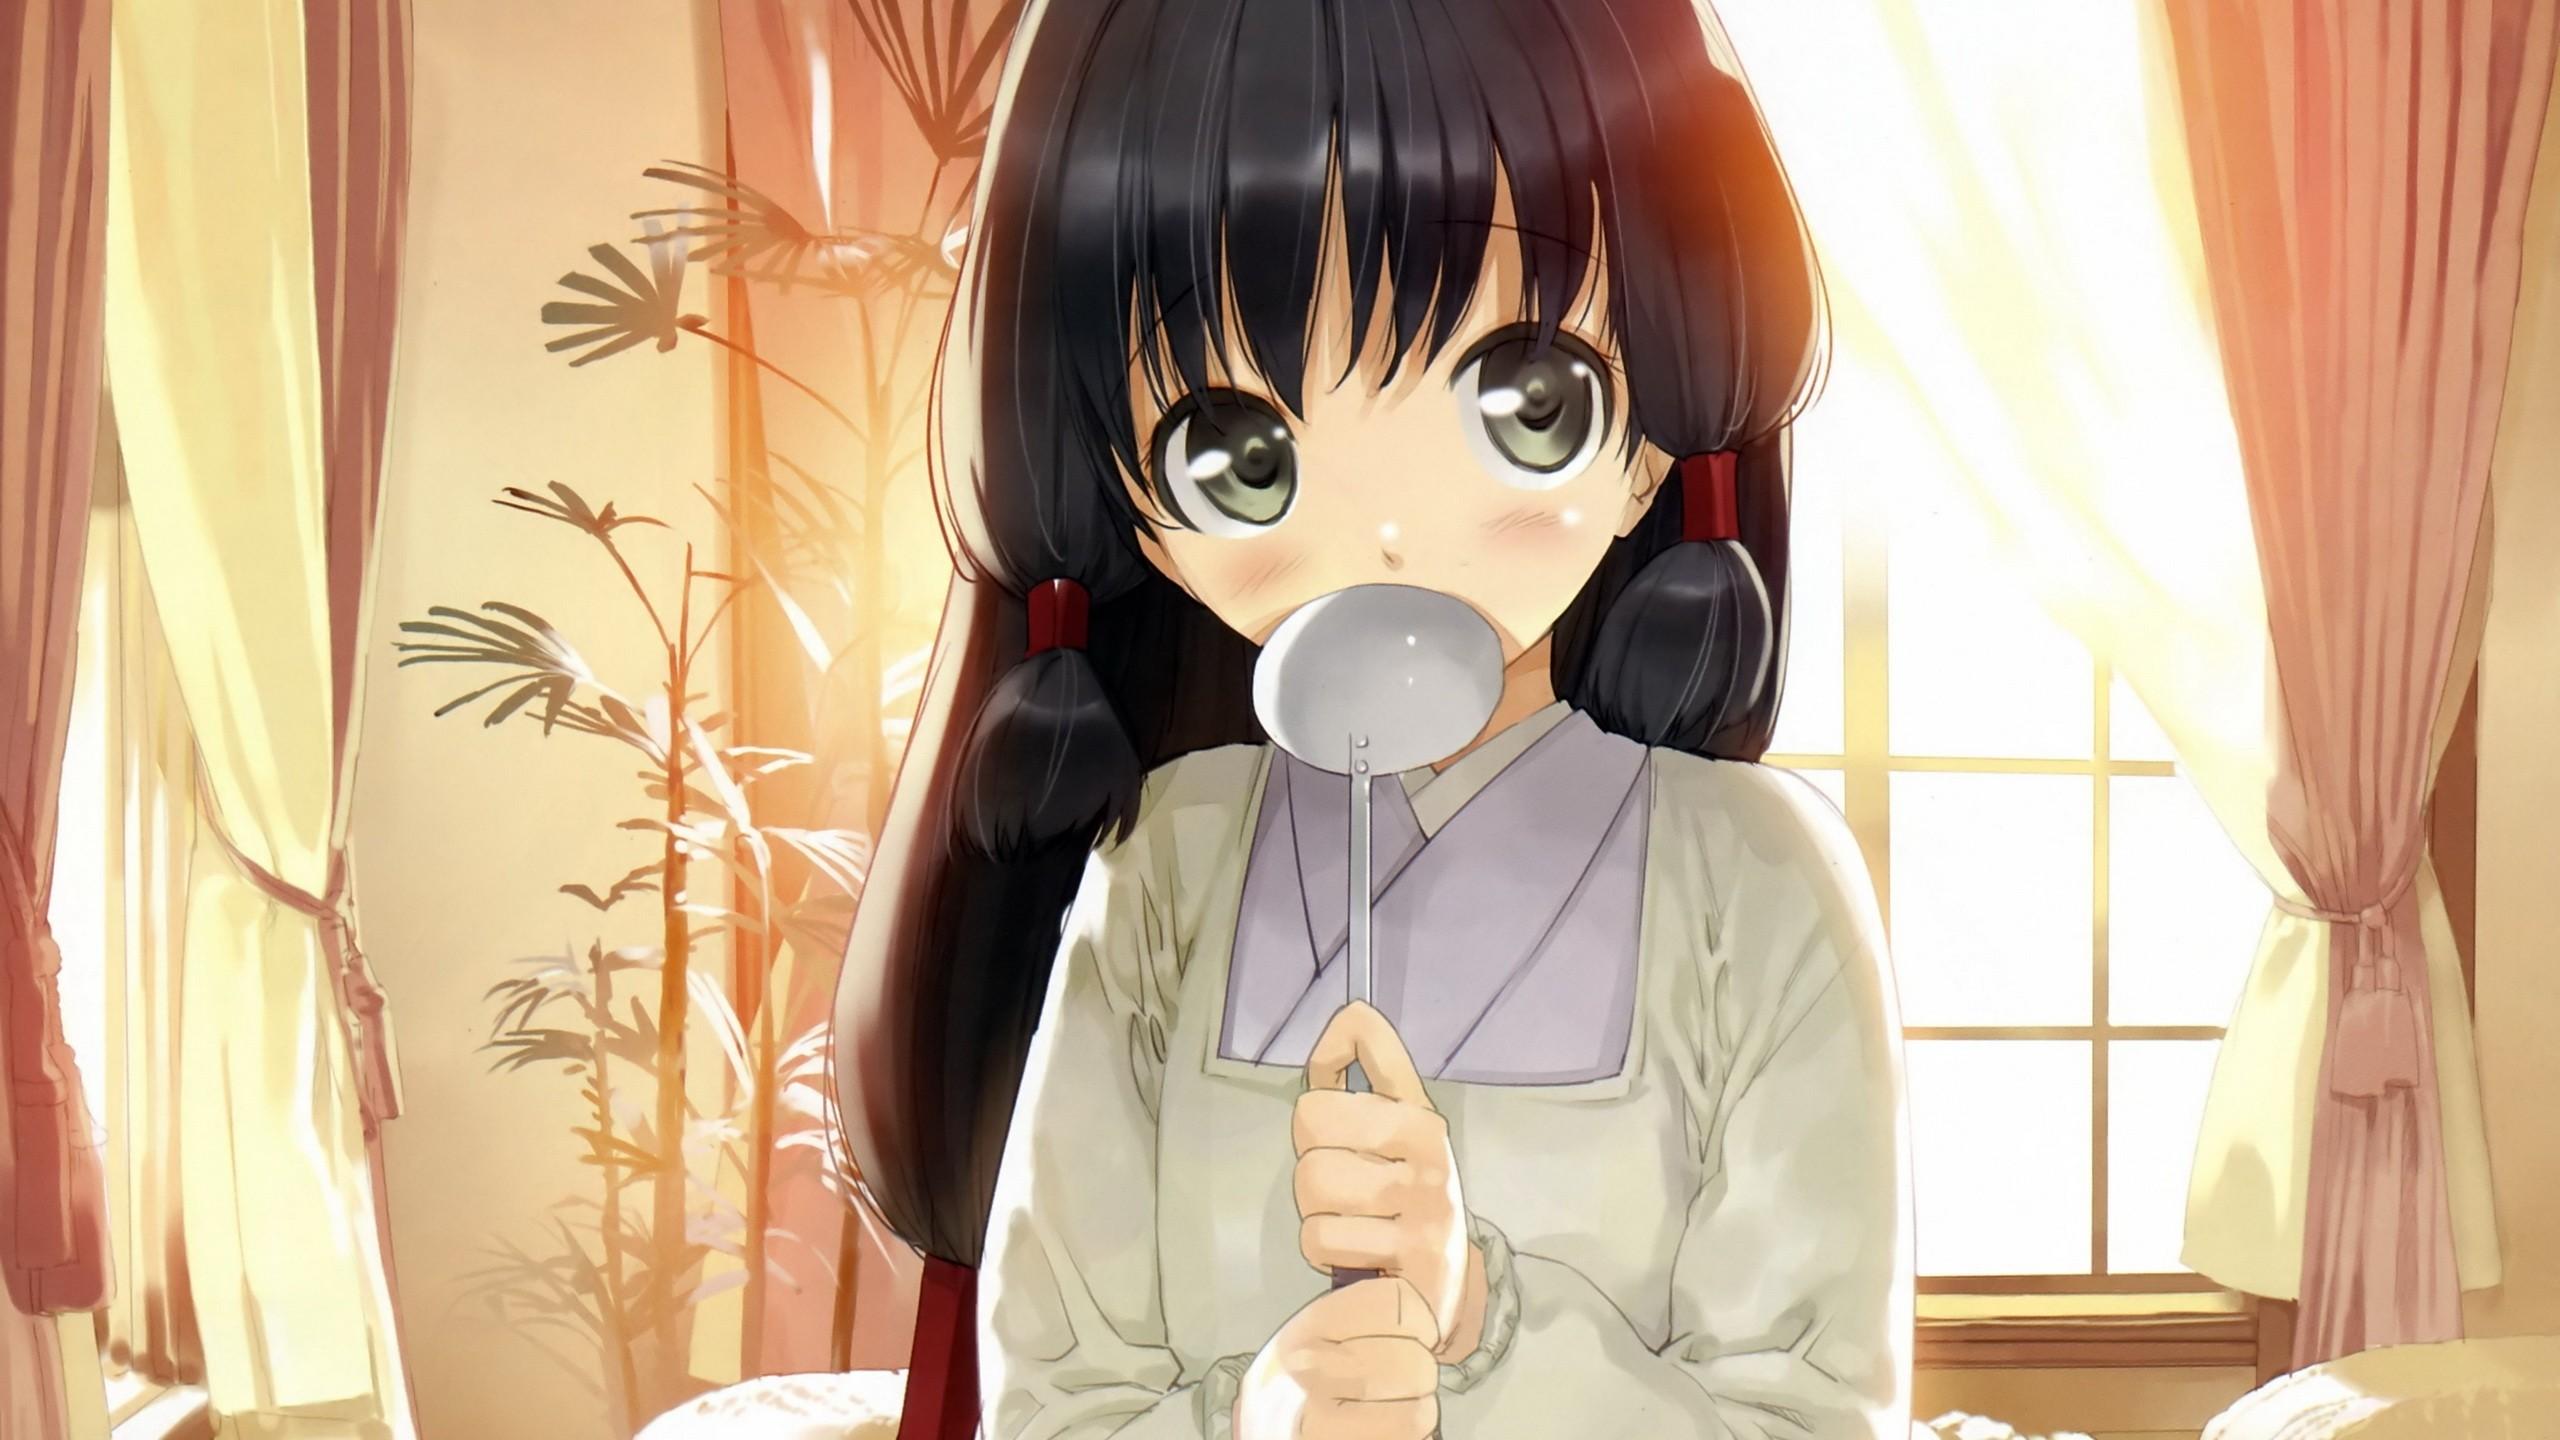 Anime 2560x1440 anime girls anime Nanatsu no Fushigi no Owarutoki eyes Japanese clothes brunette long hair green eyes